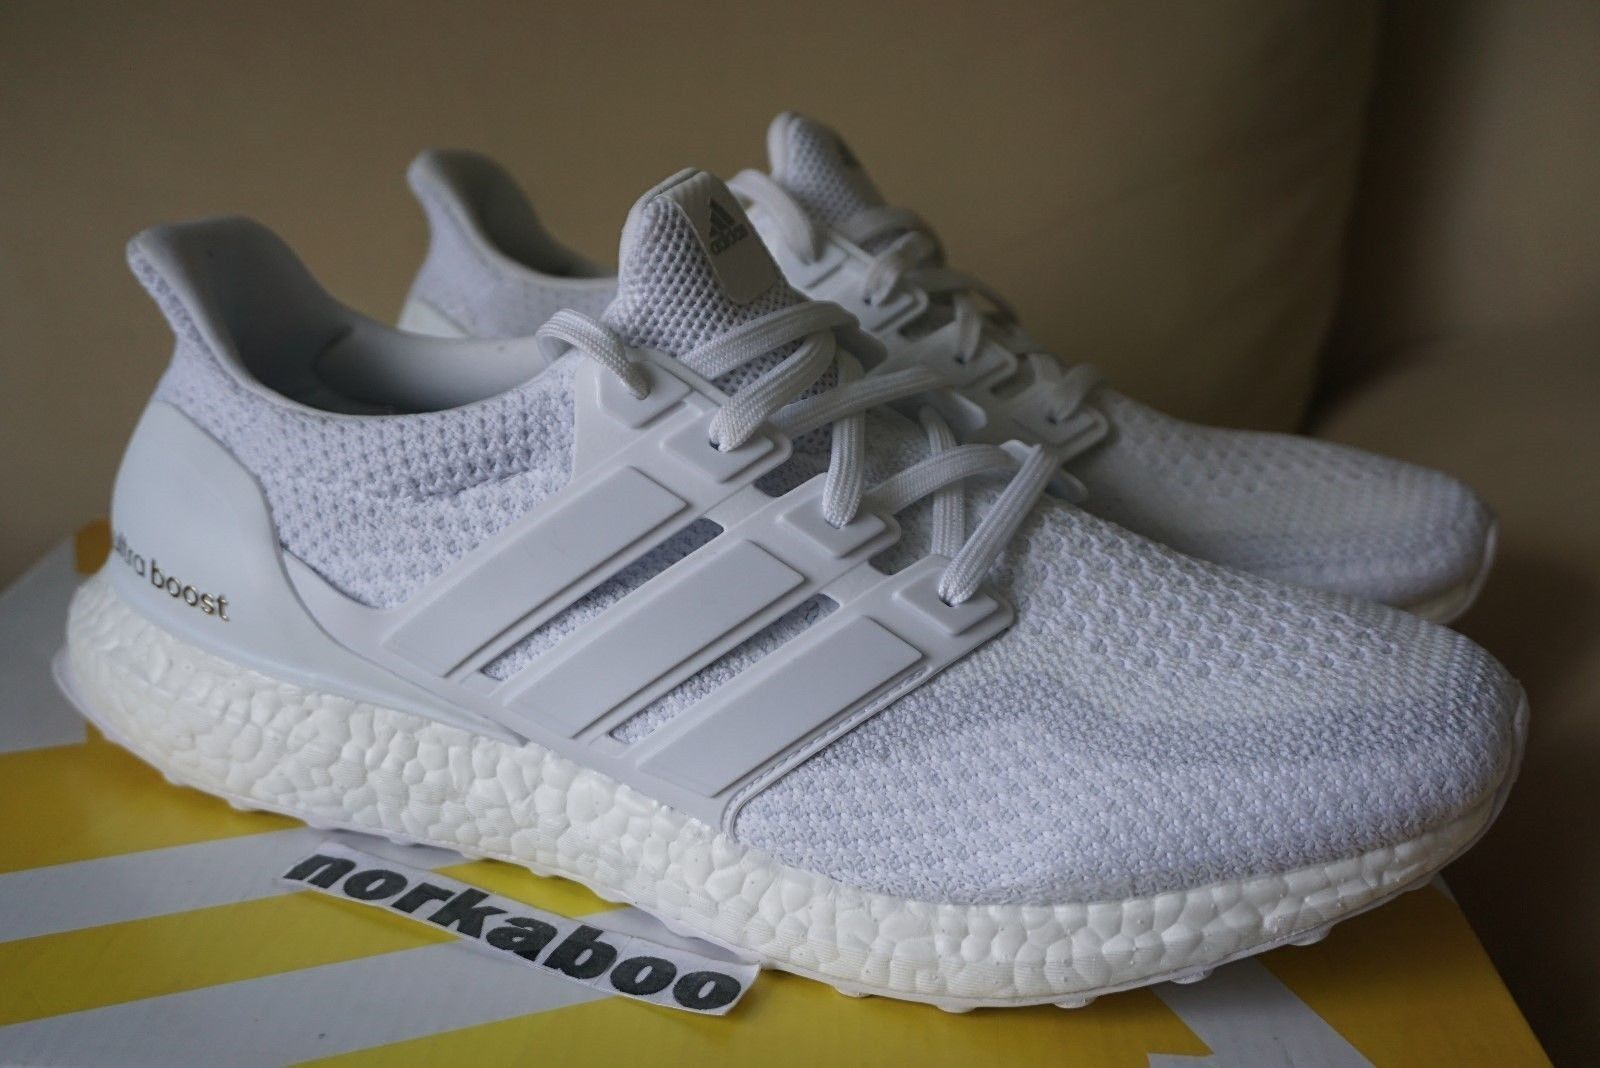 73584cf662f Adidas Adidas Ultra Boost M 2.0 Triple White Aq5929